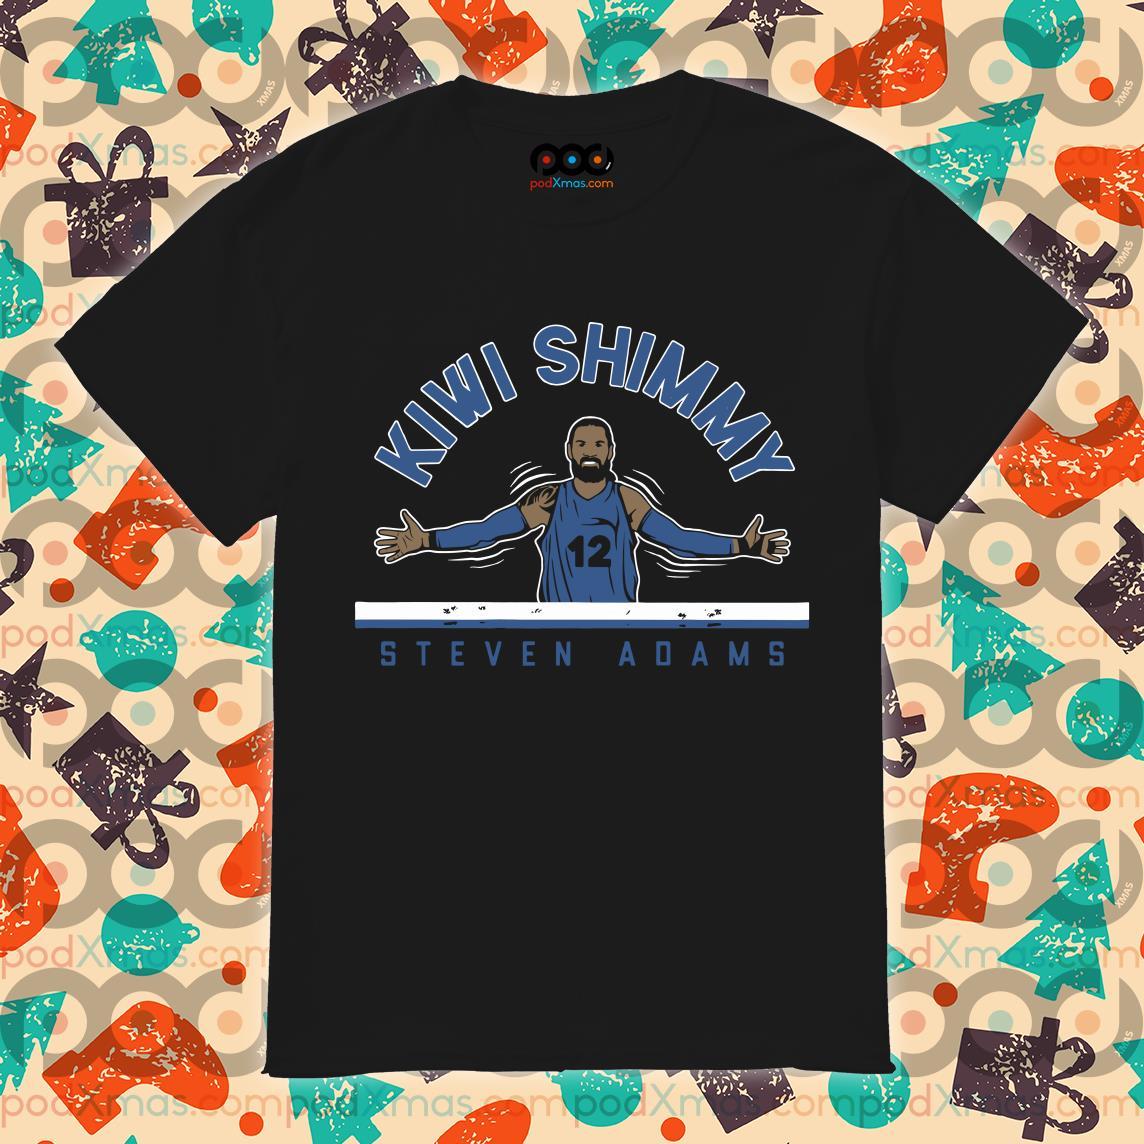 Steven Adams Kiwi Shimmy Shirt